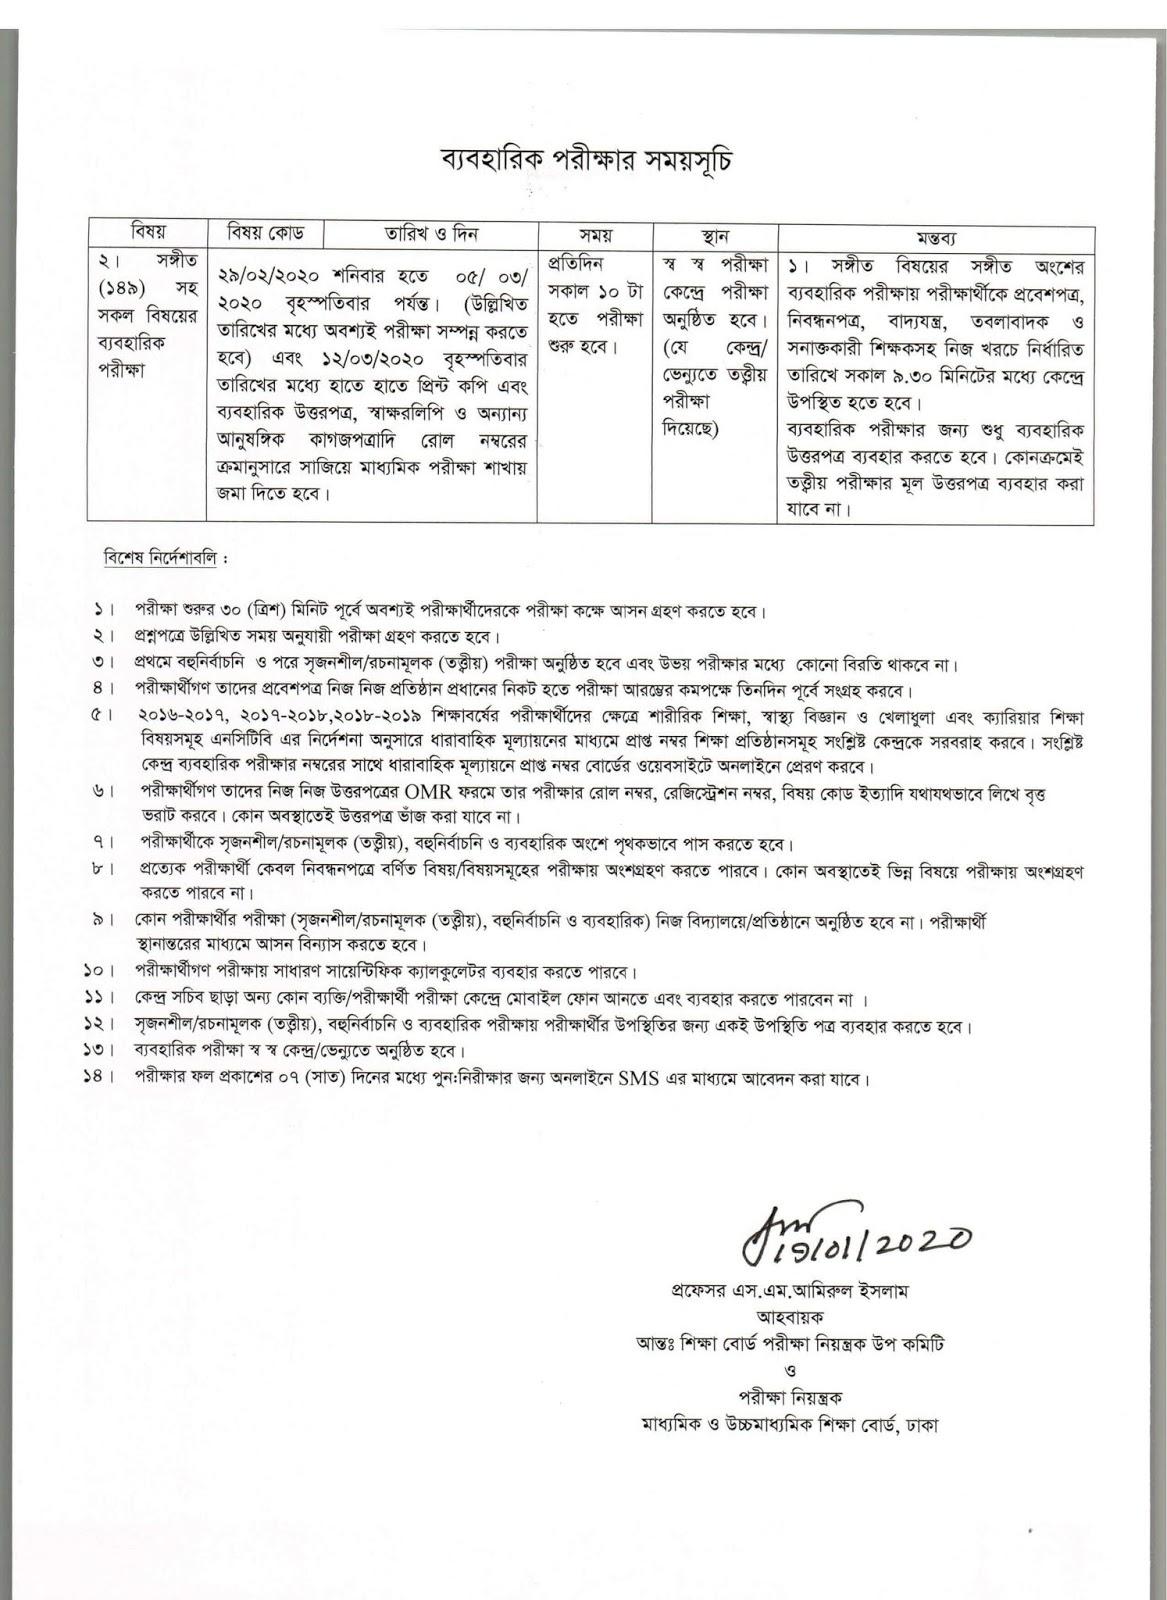 SSC-Routine-2020-PDF-image-2